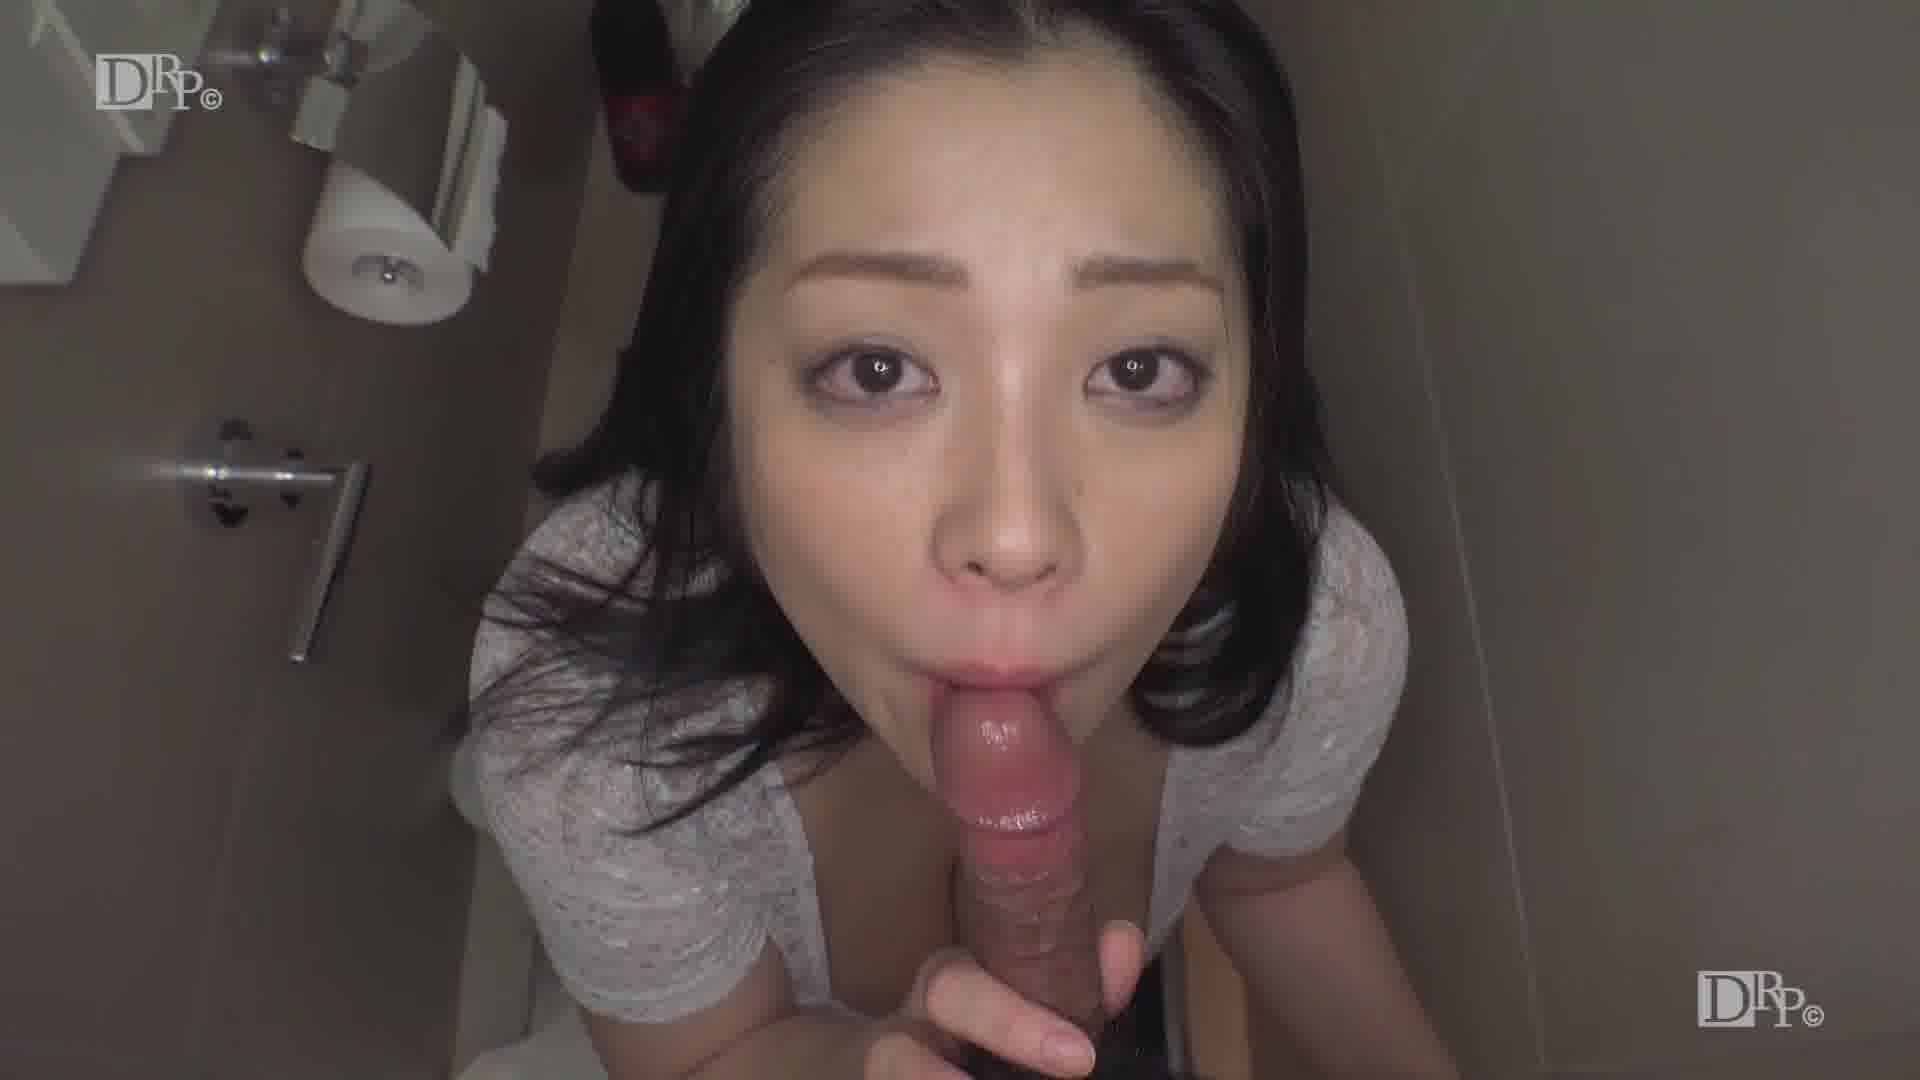 THE 未公開 ~個室トイレでこっそりしゃぶるの大好き~ - 小向美奈子【巨乳・口内発射・美尻】